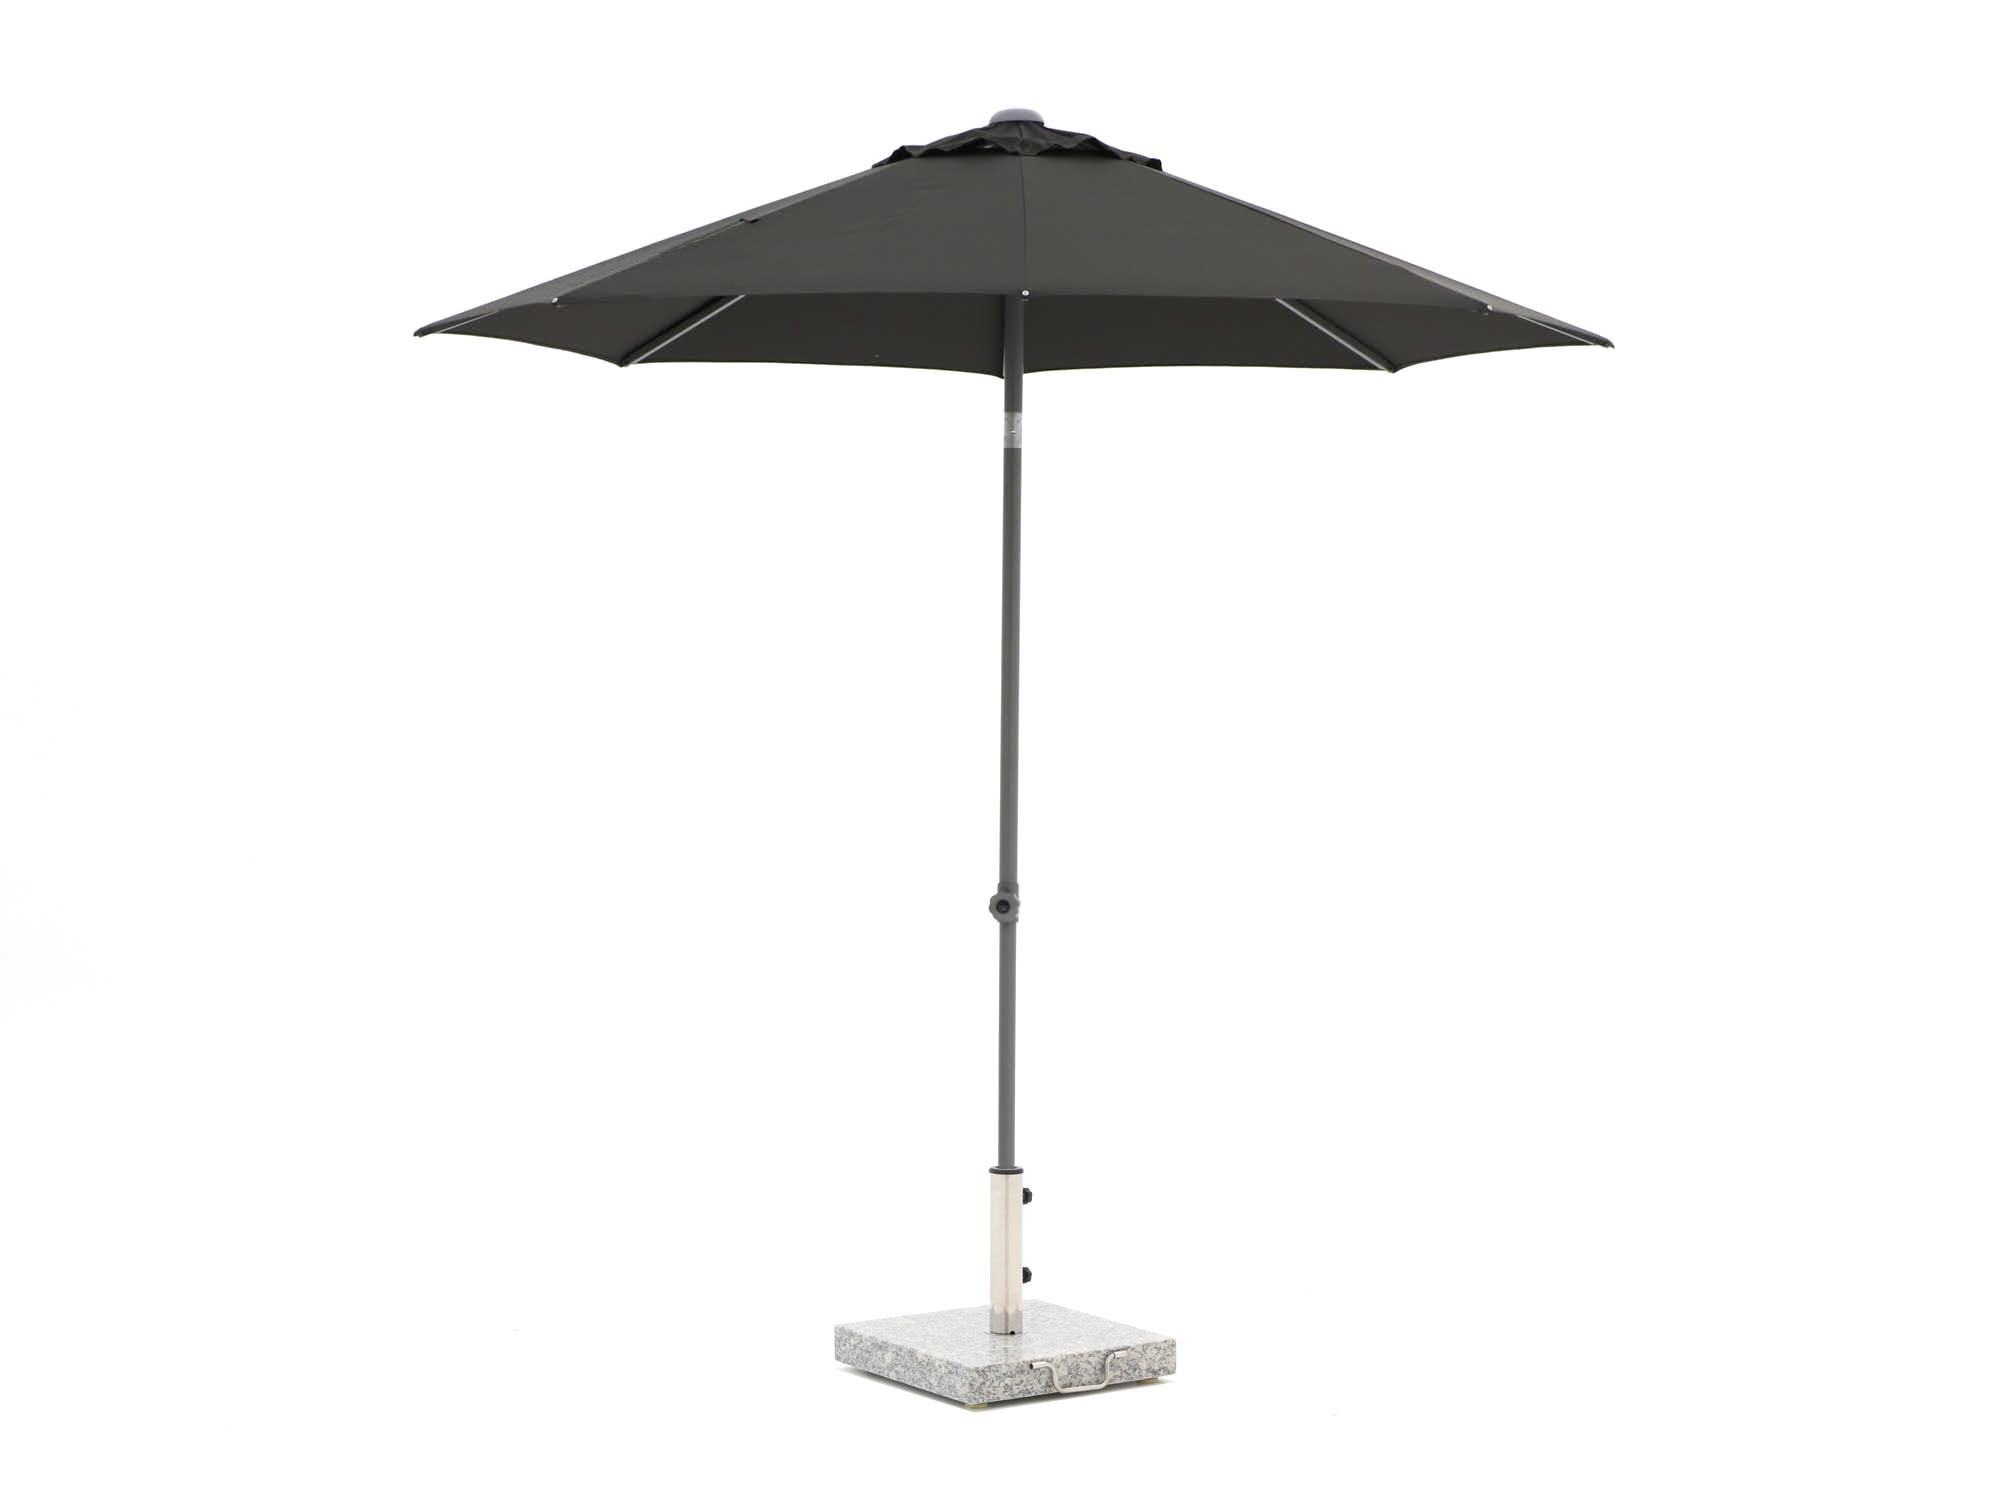 Shadowline Push-up parasol ø 250cm - Laagste prijsgarantie!